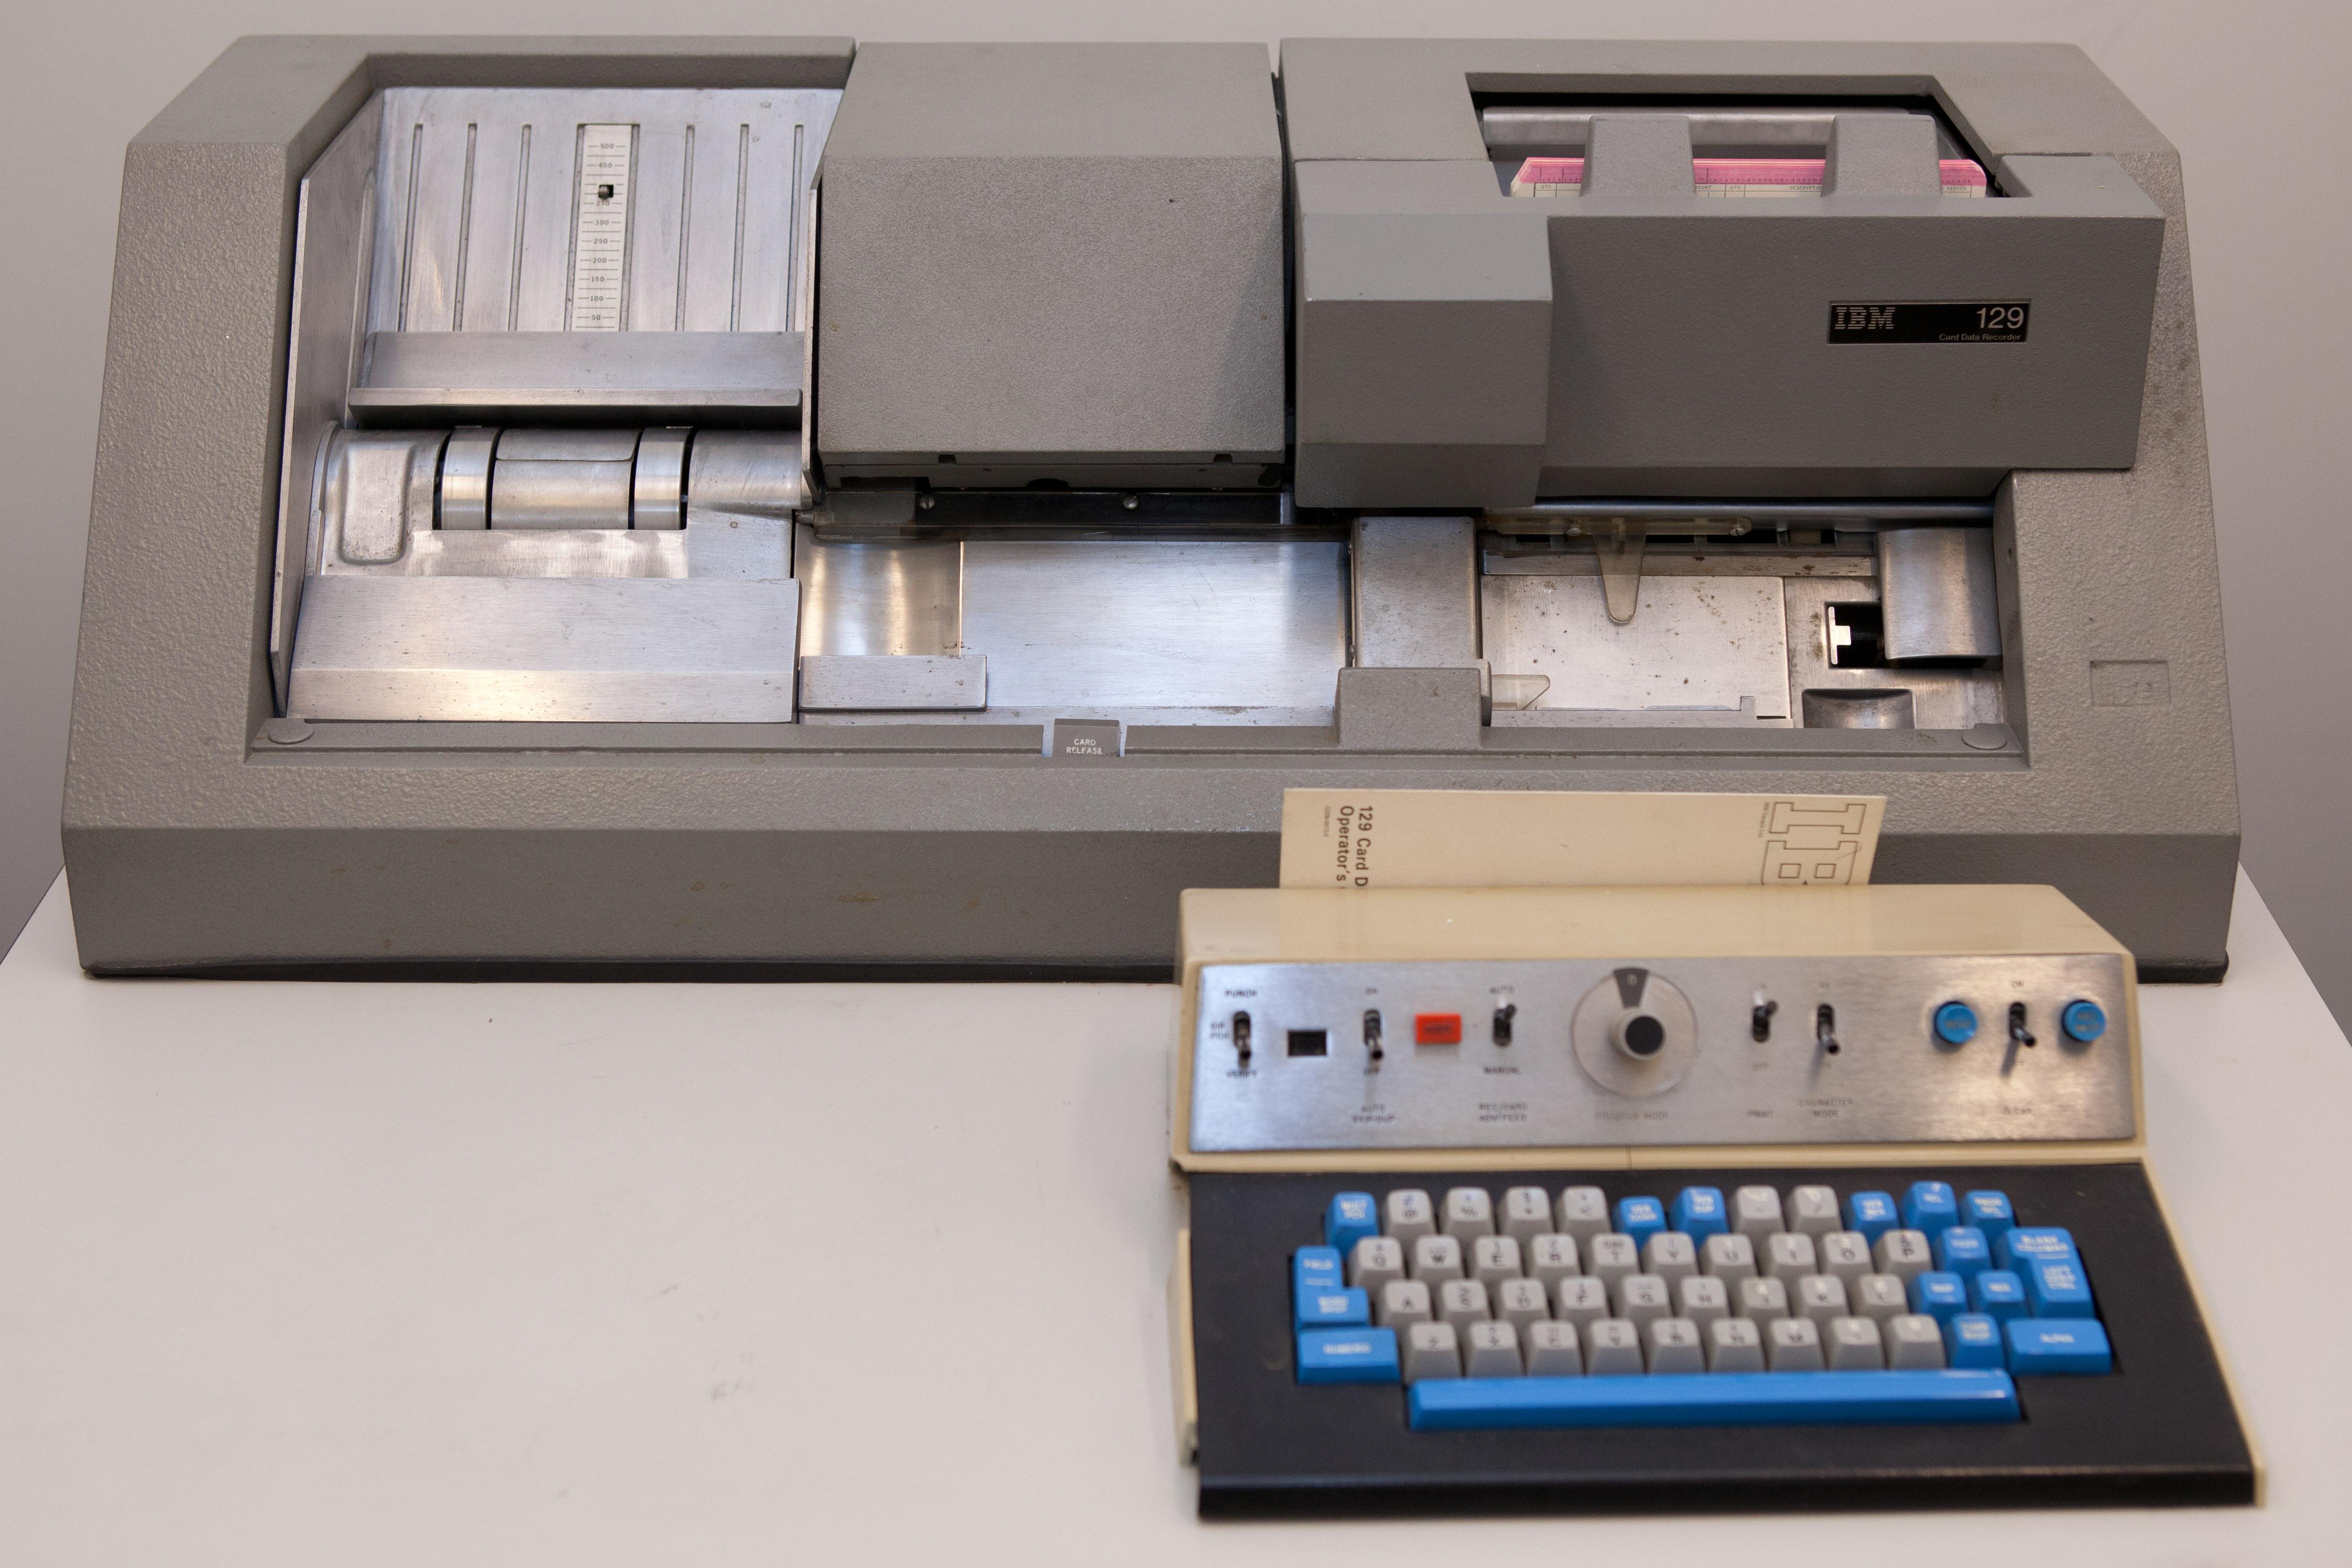 IBM_129_Card_Data_Recorder.jpg